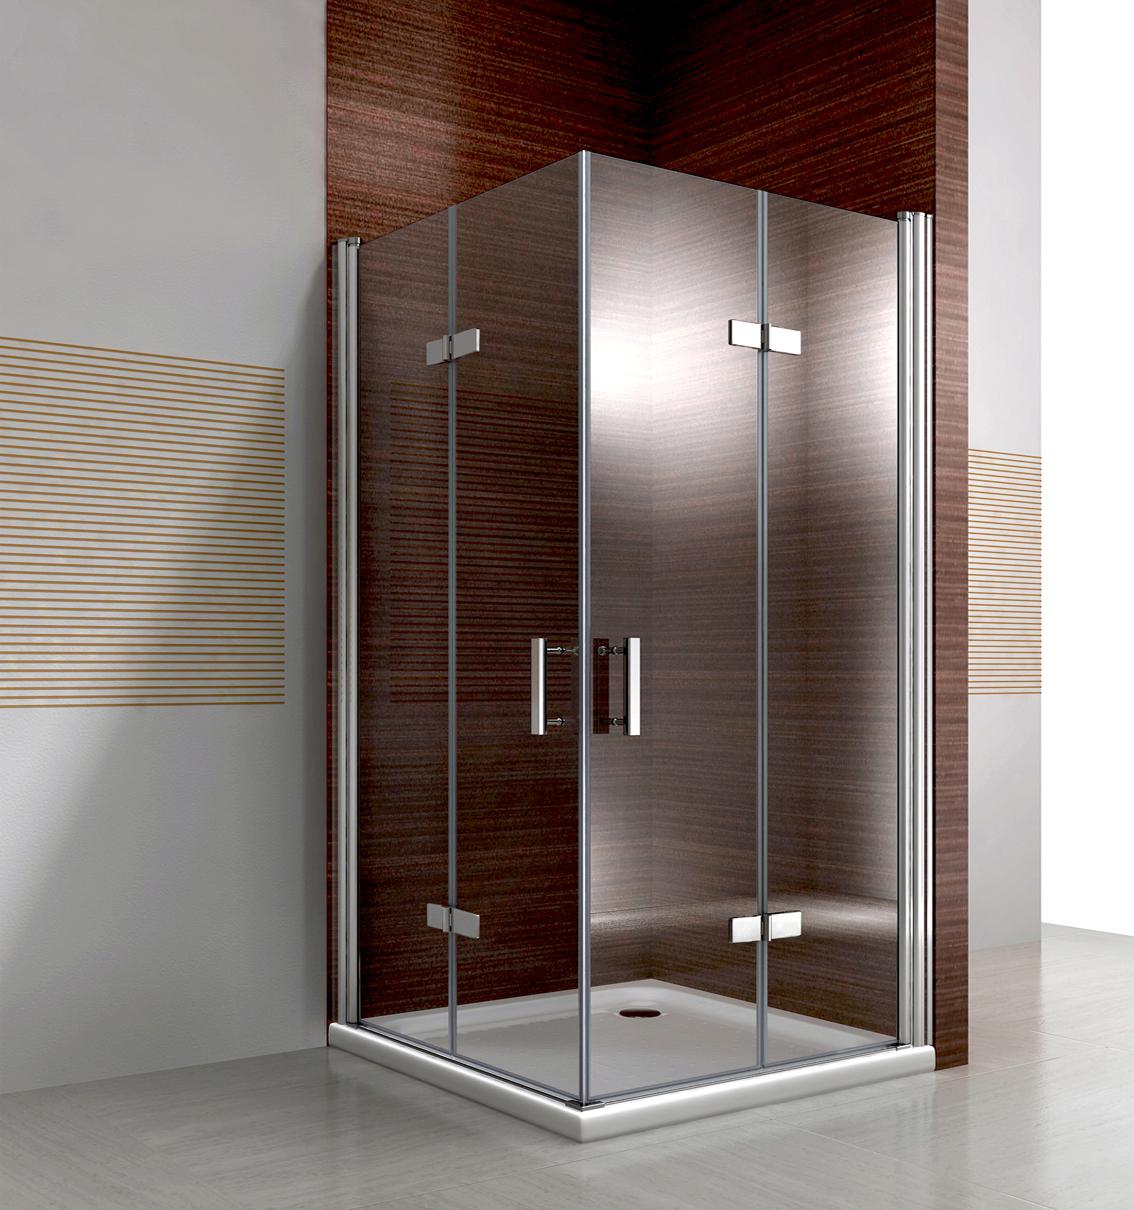 Cabina de ducha entrada esquina puerta plegable nano esg cristal 195cm ebay - Puerta plegable bano ...